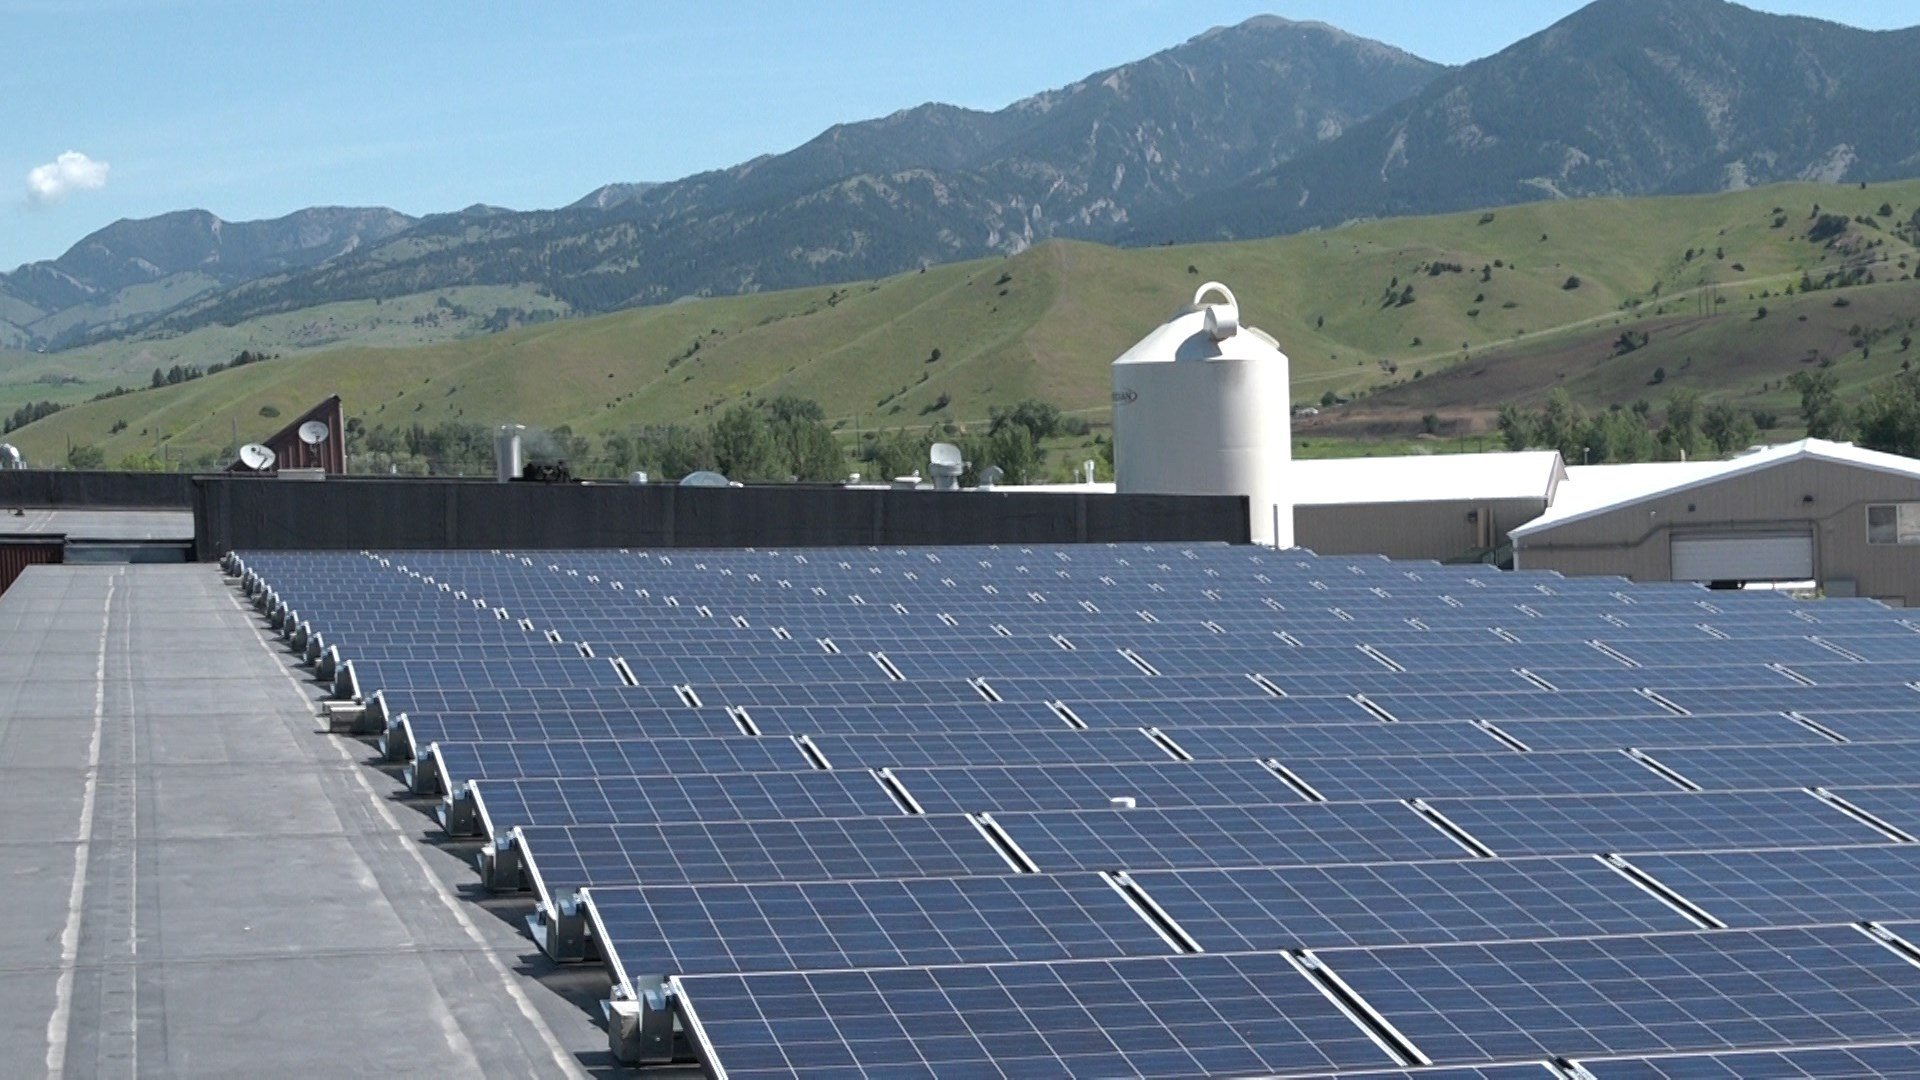 Solar-power panels in Bozeman